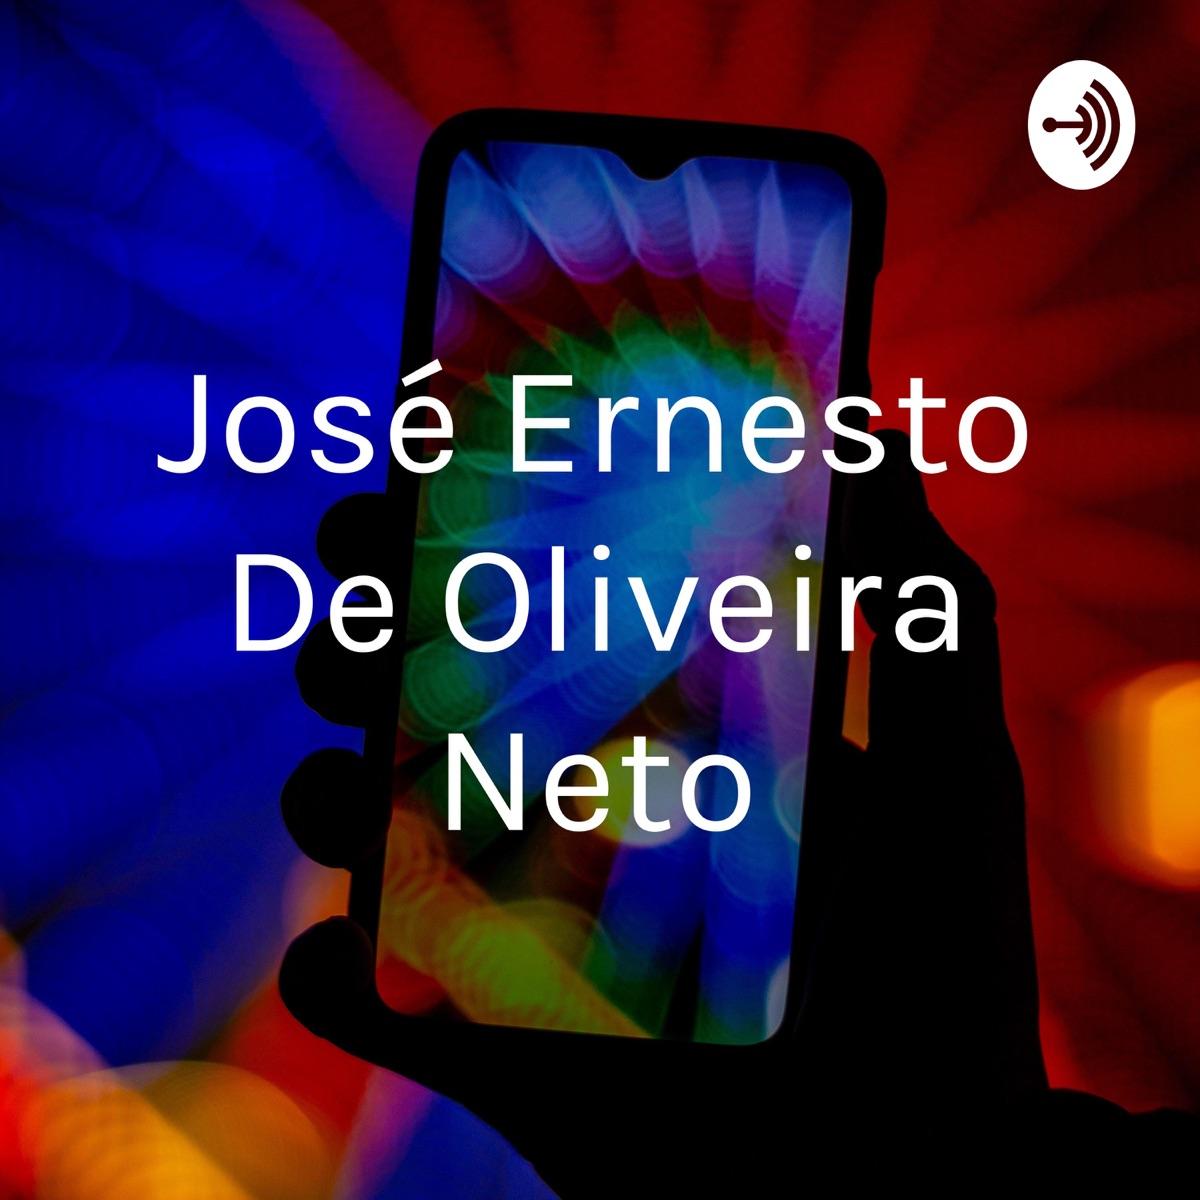 José Ernesto De Oliveira Neto